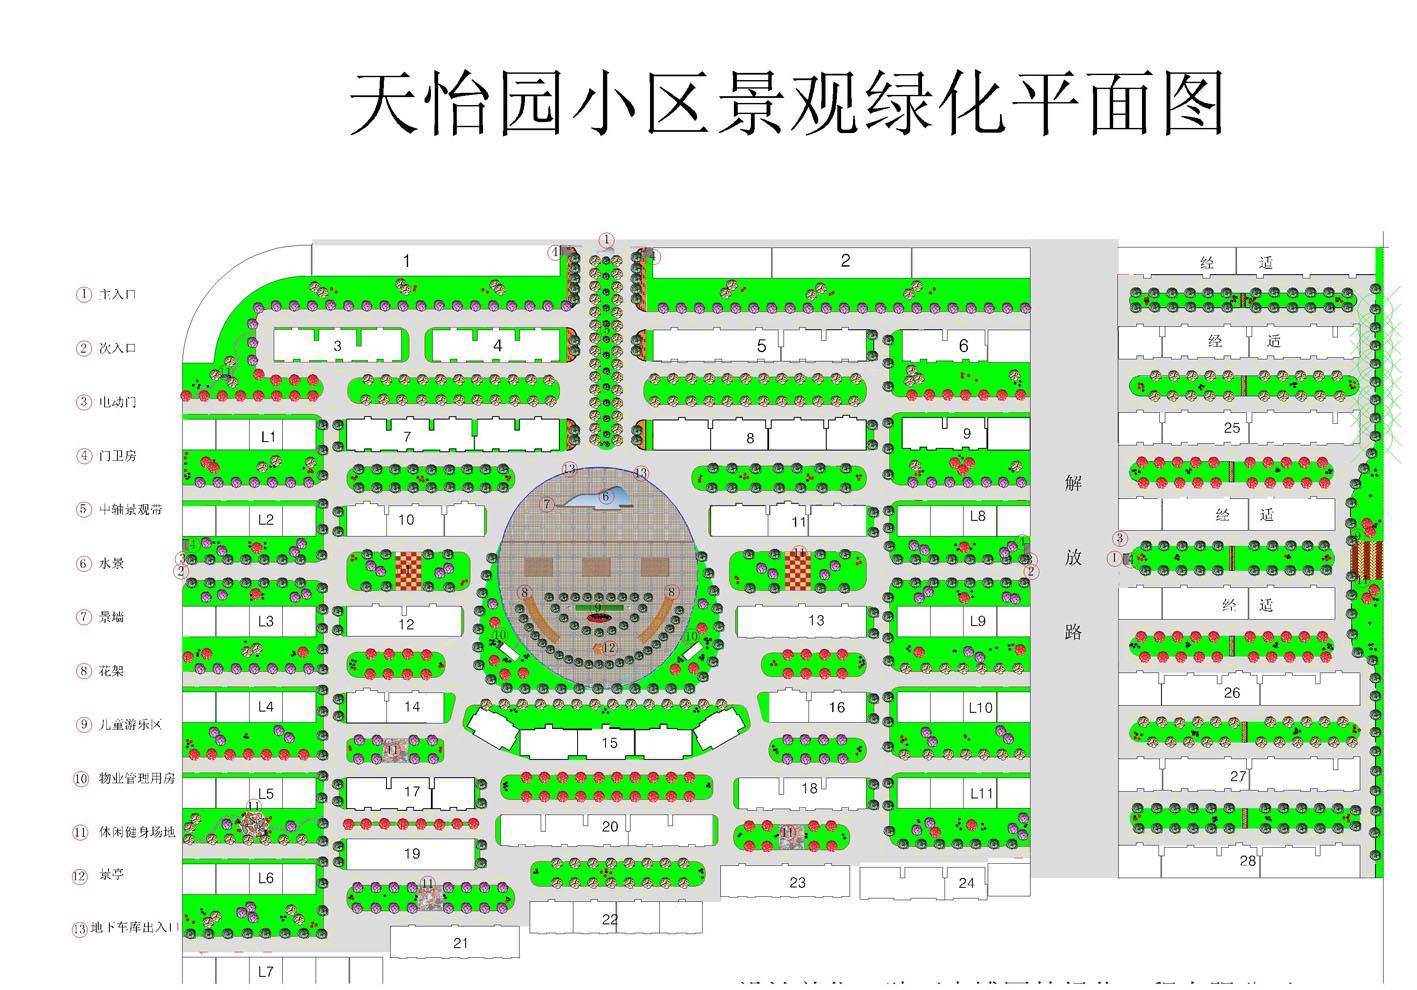 zyok888] 平面设计作品展示区 → 小区绿化平面图   此主题相关图片如